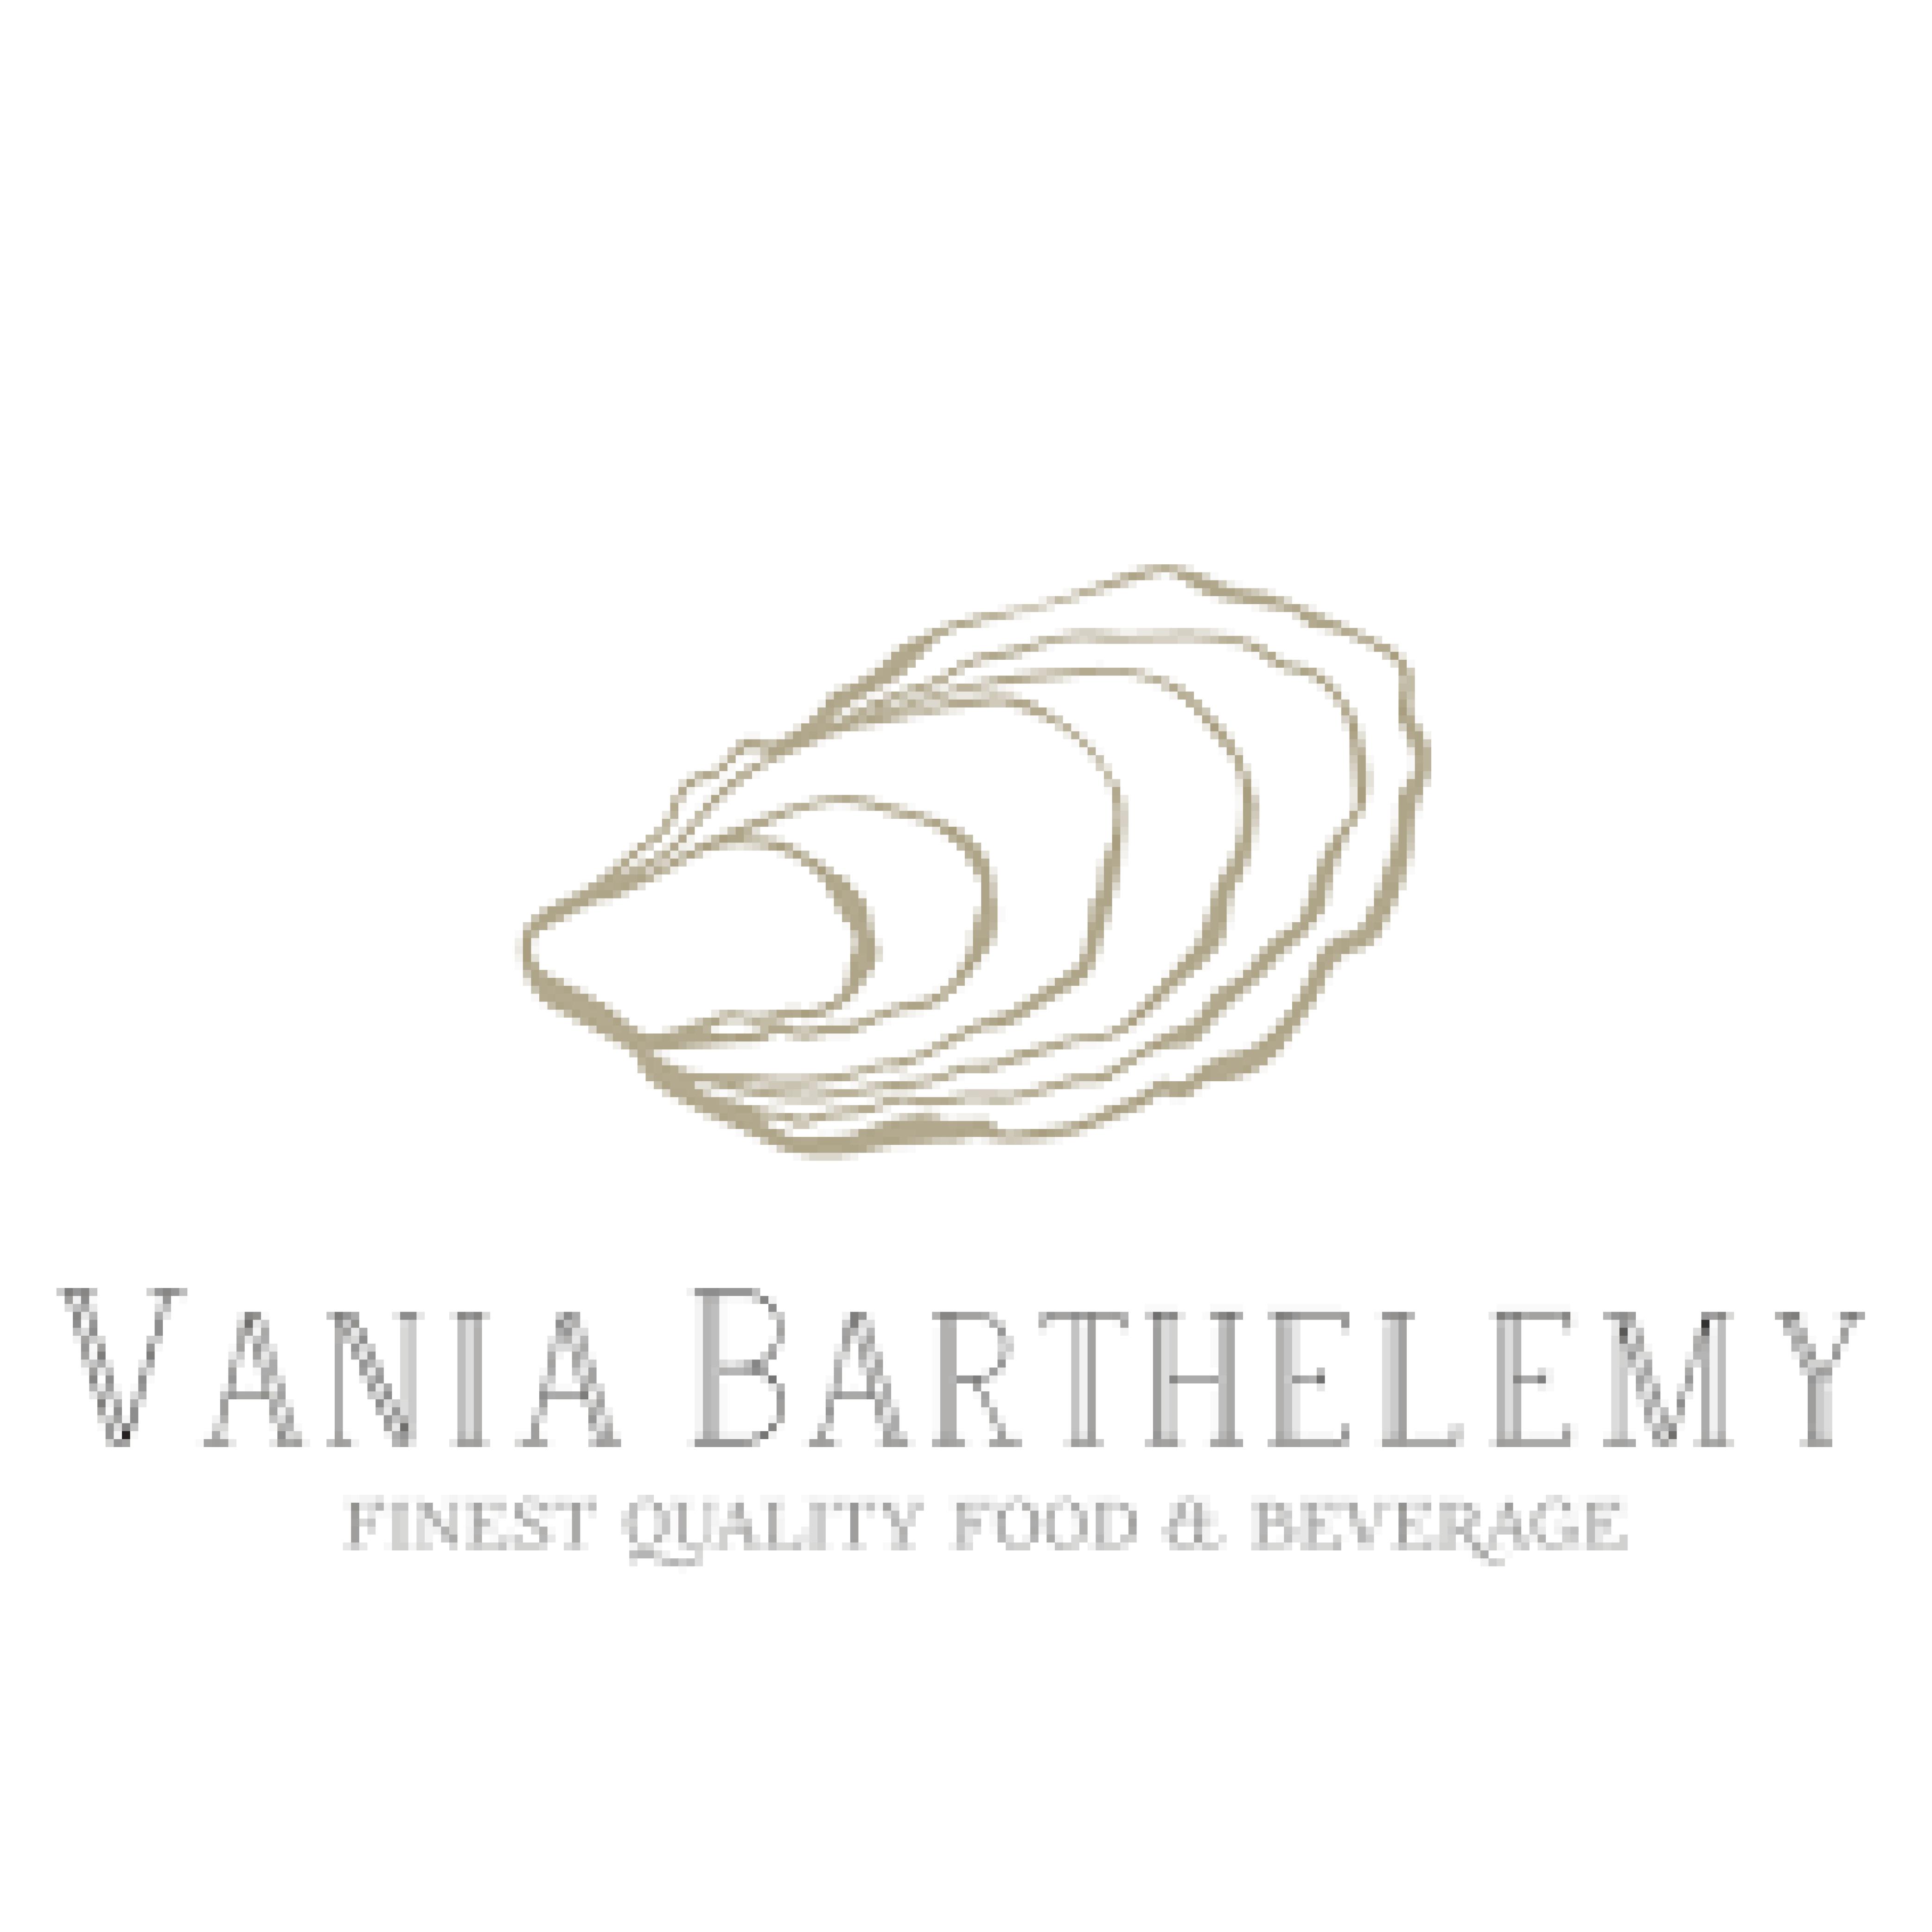 Vania Barthelemy a Vinoforum Class